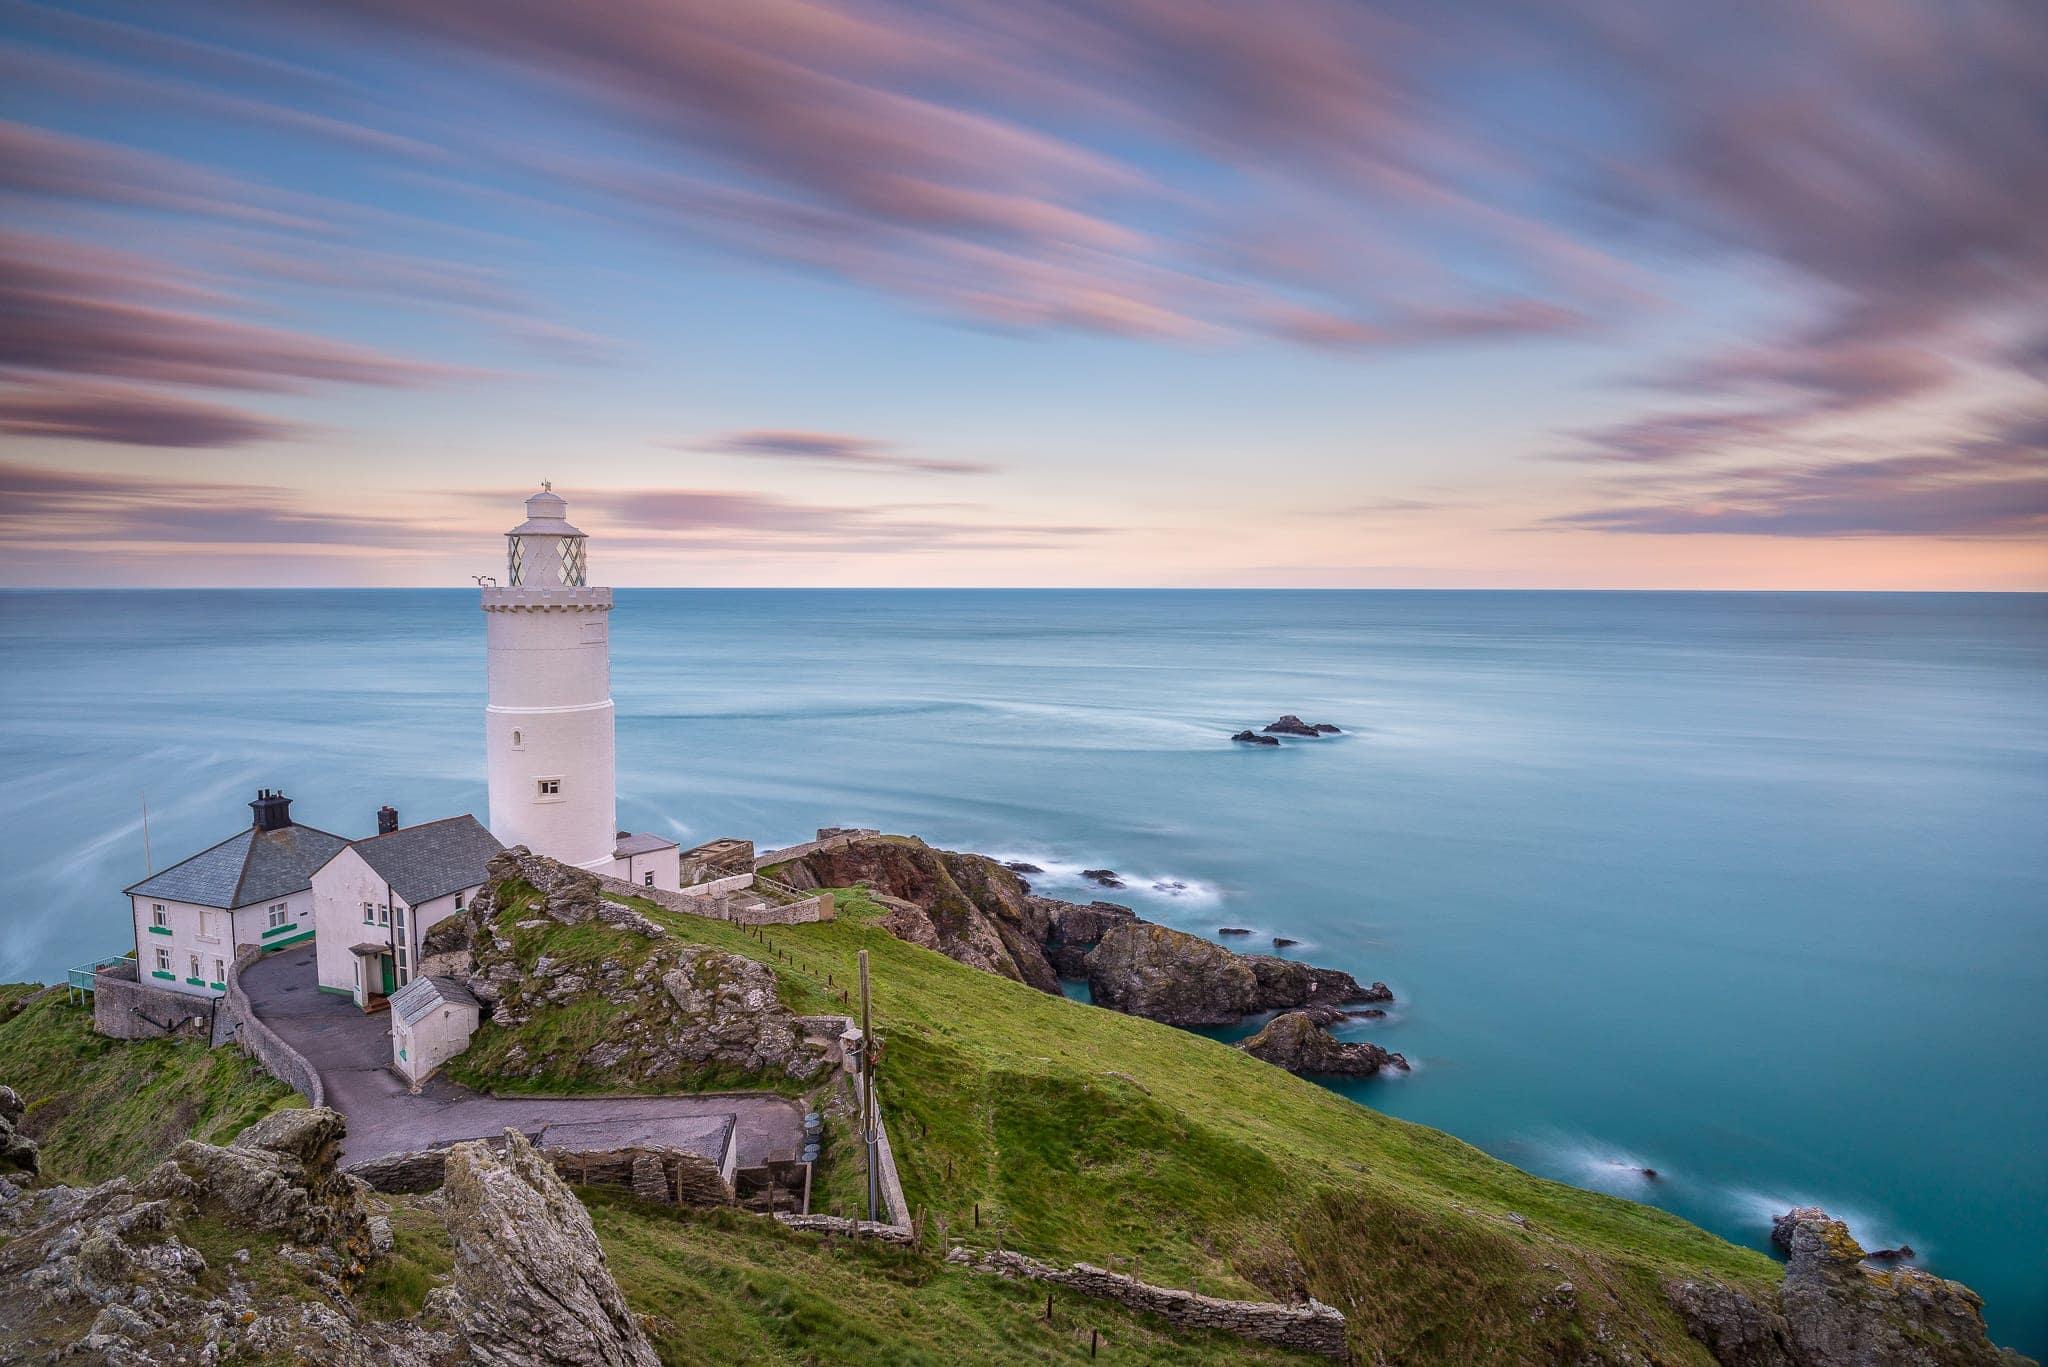 Francesco Gola Seascape Landscape Photography Uk Devon Star Lighthouse Long Exposure